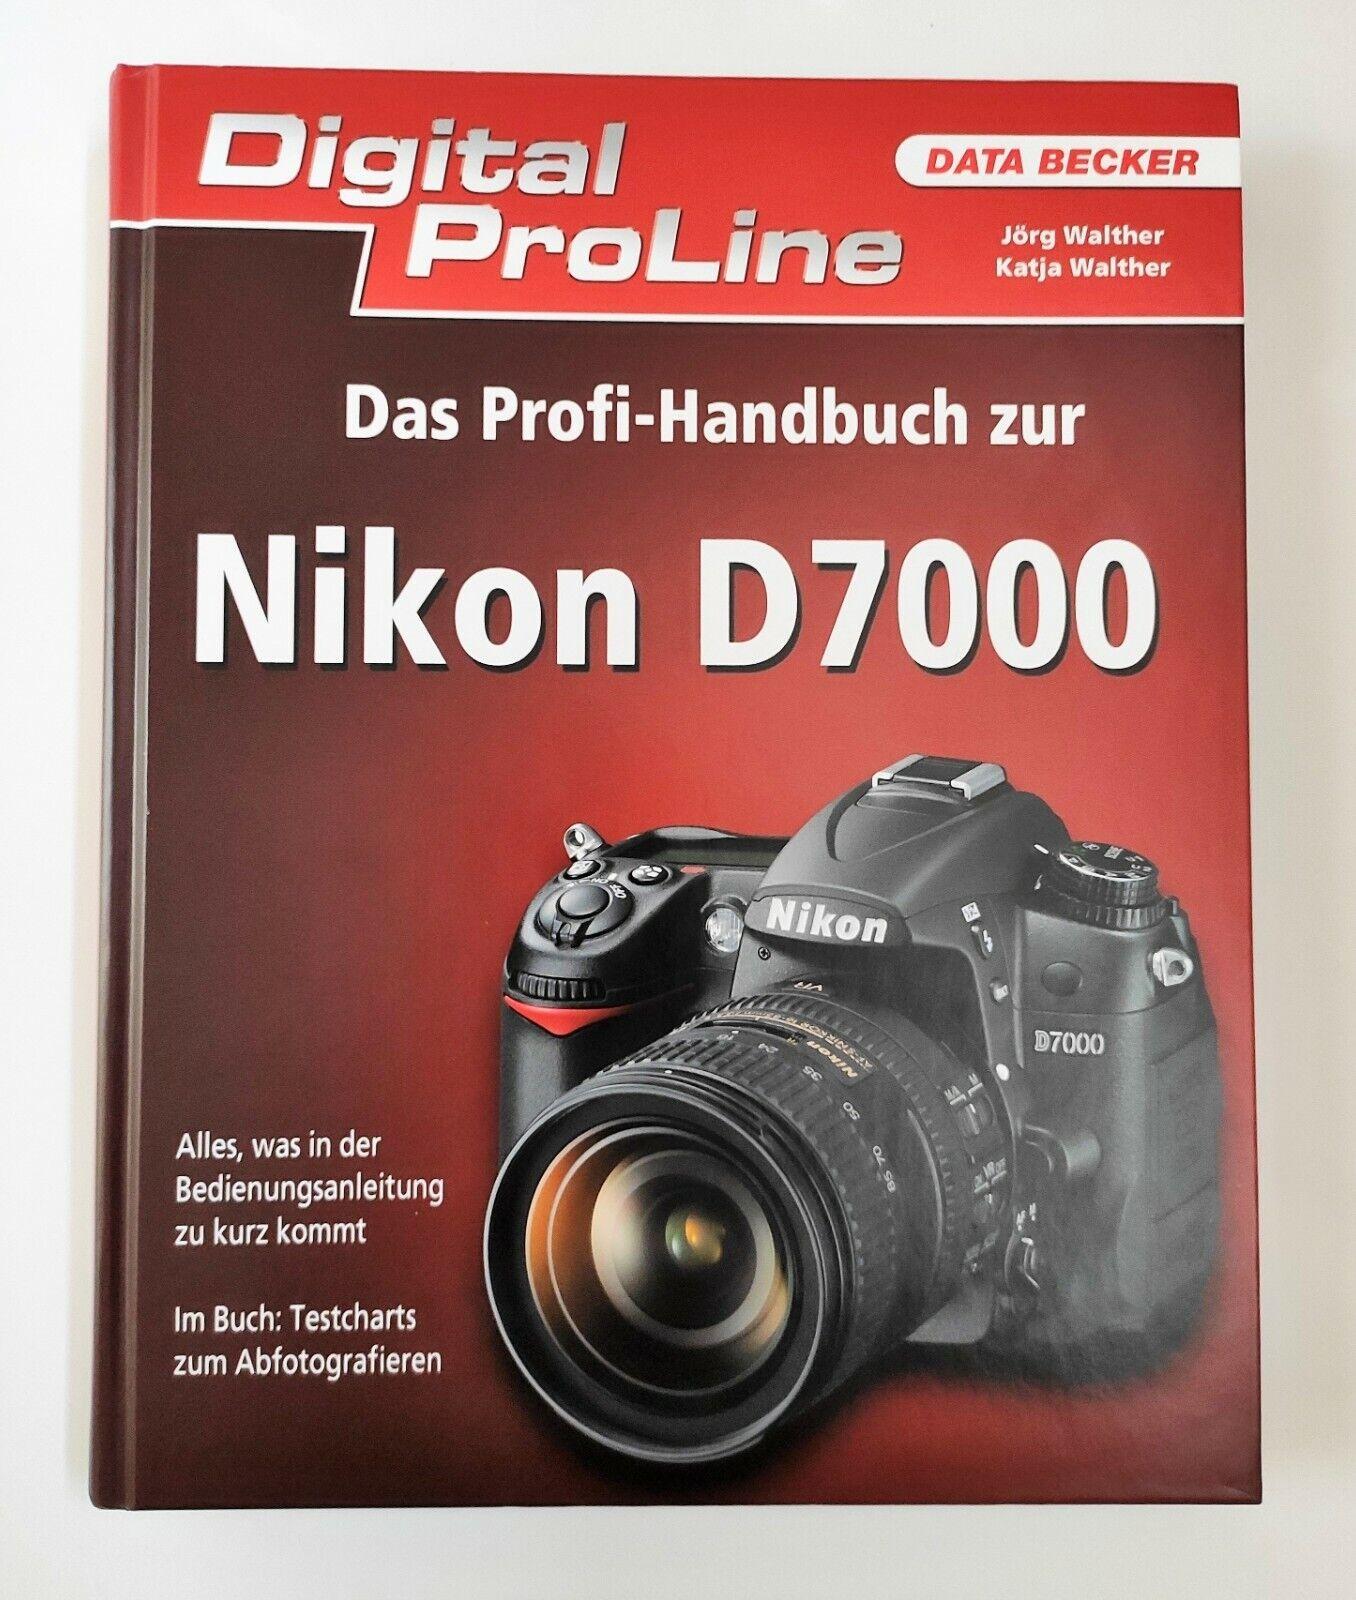 Digital ProLine: Das Profihandbuch zur Nikon D7000 9783815835289 - Jörg und Katja Walther